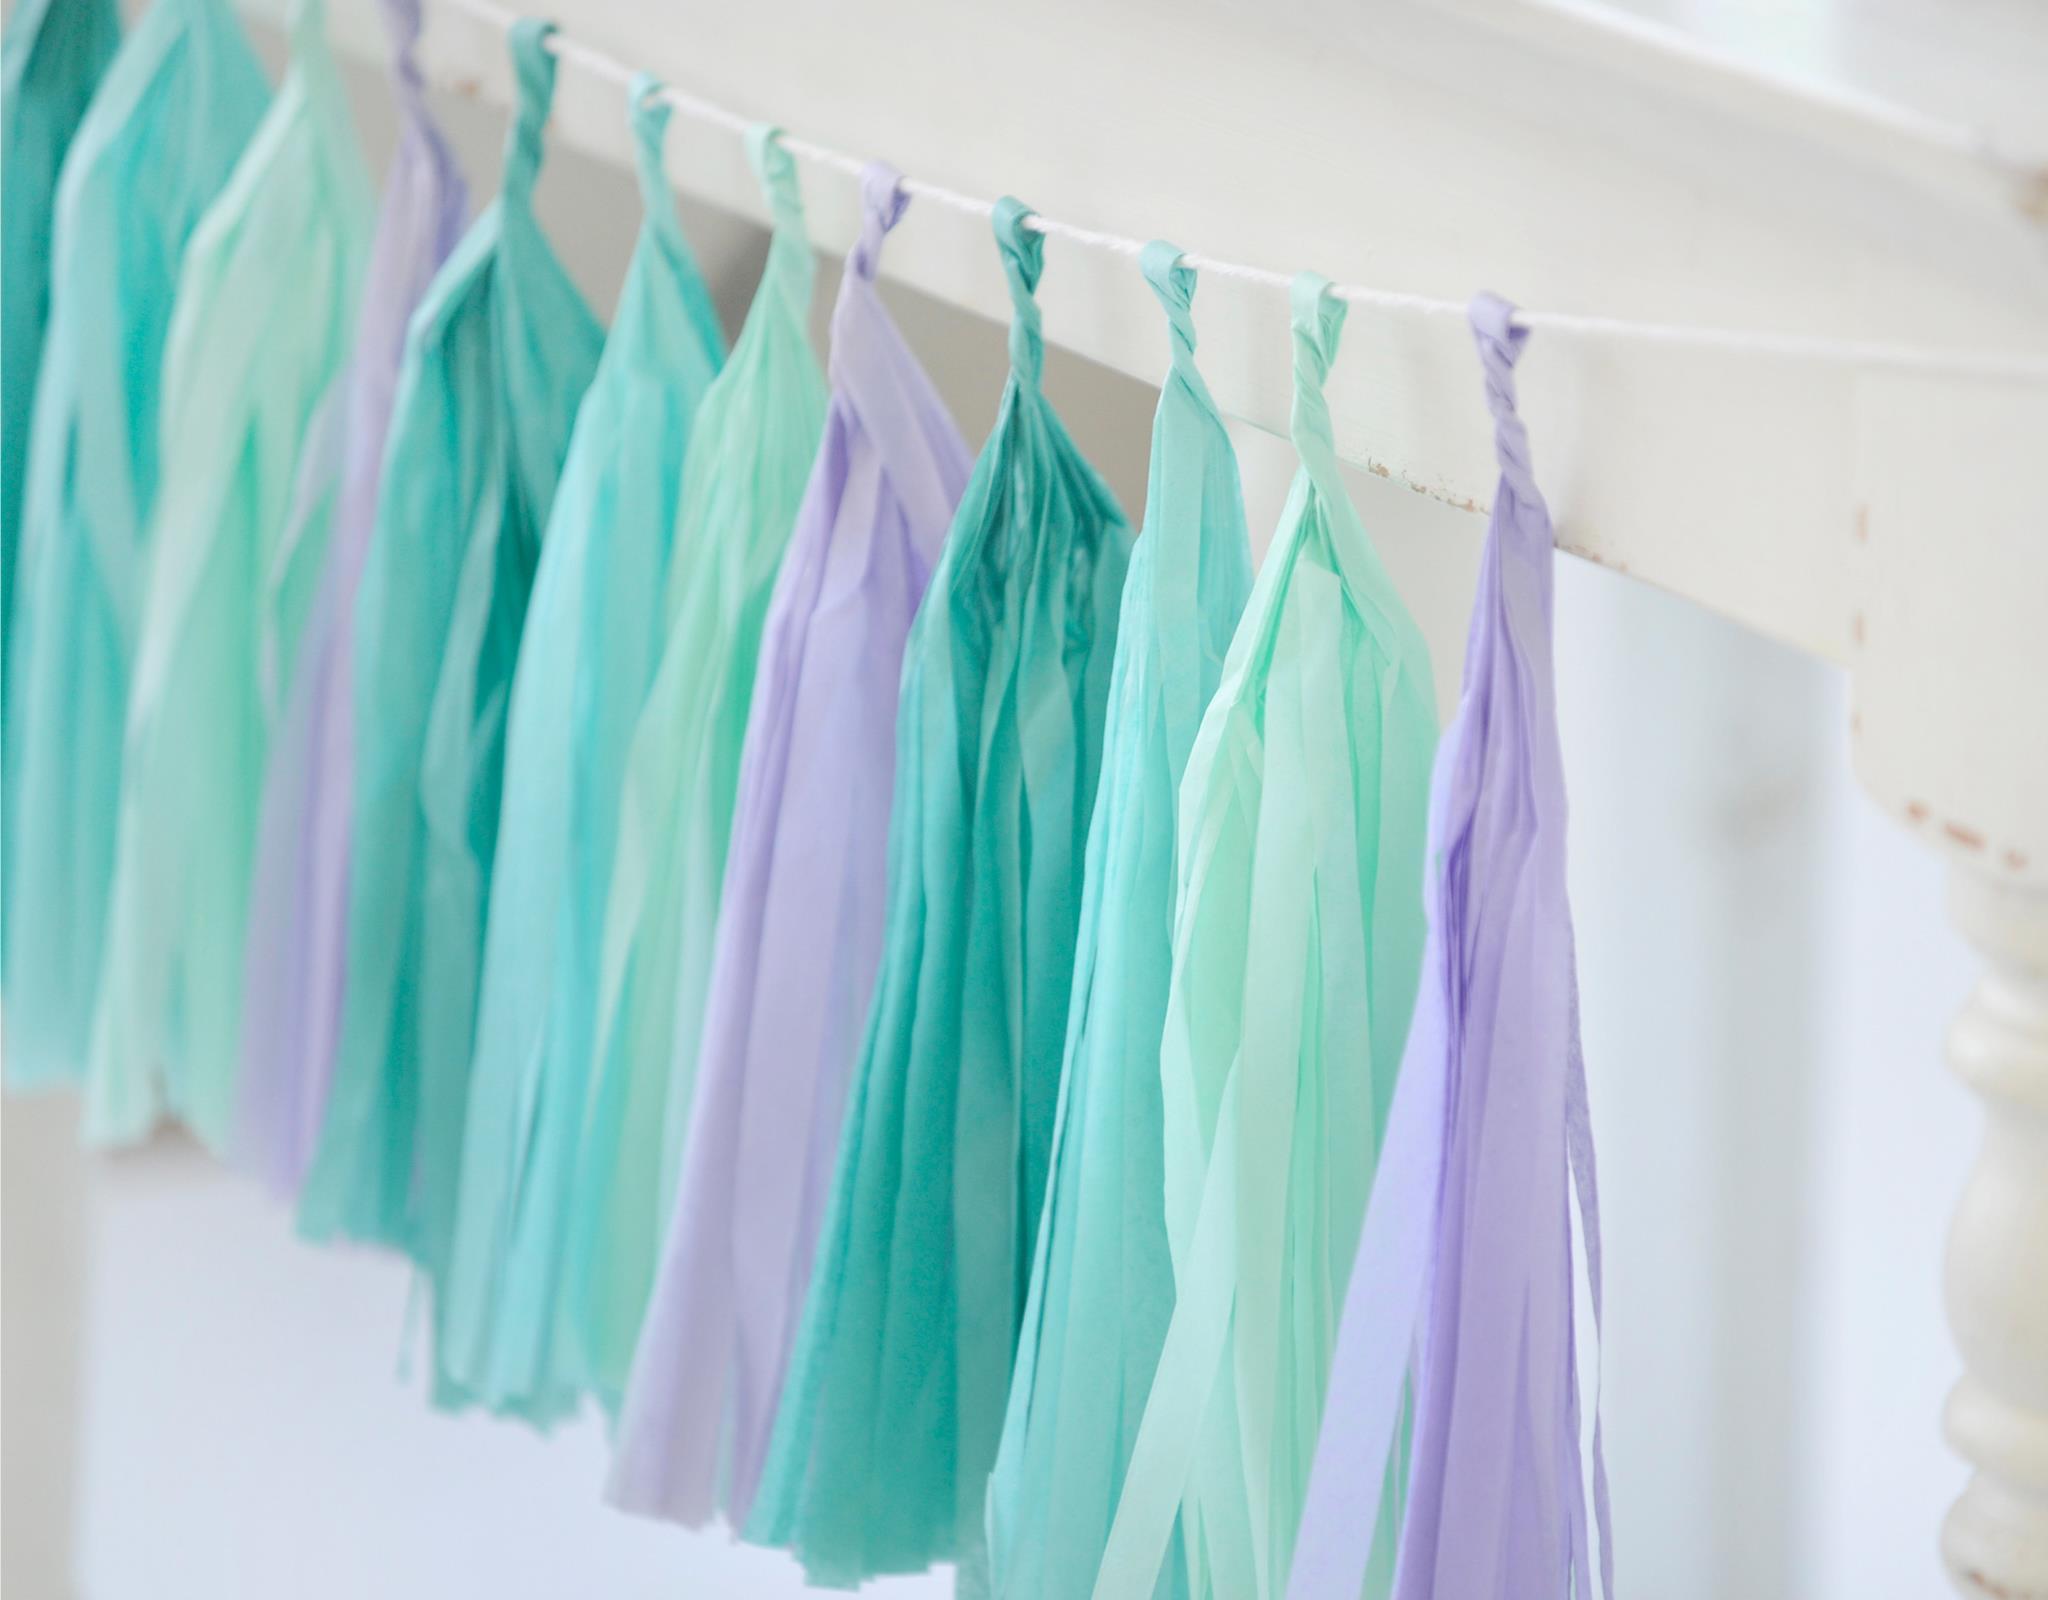 Mermaid Party Tissue Paper Tassel Garland - Project Nursery